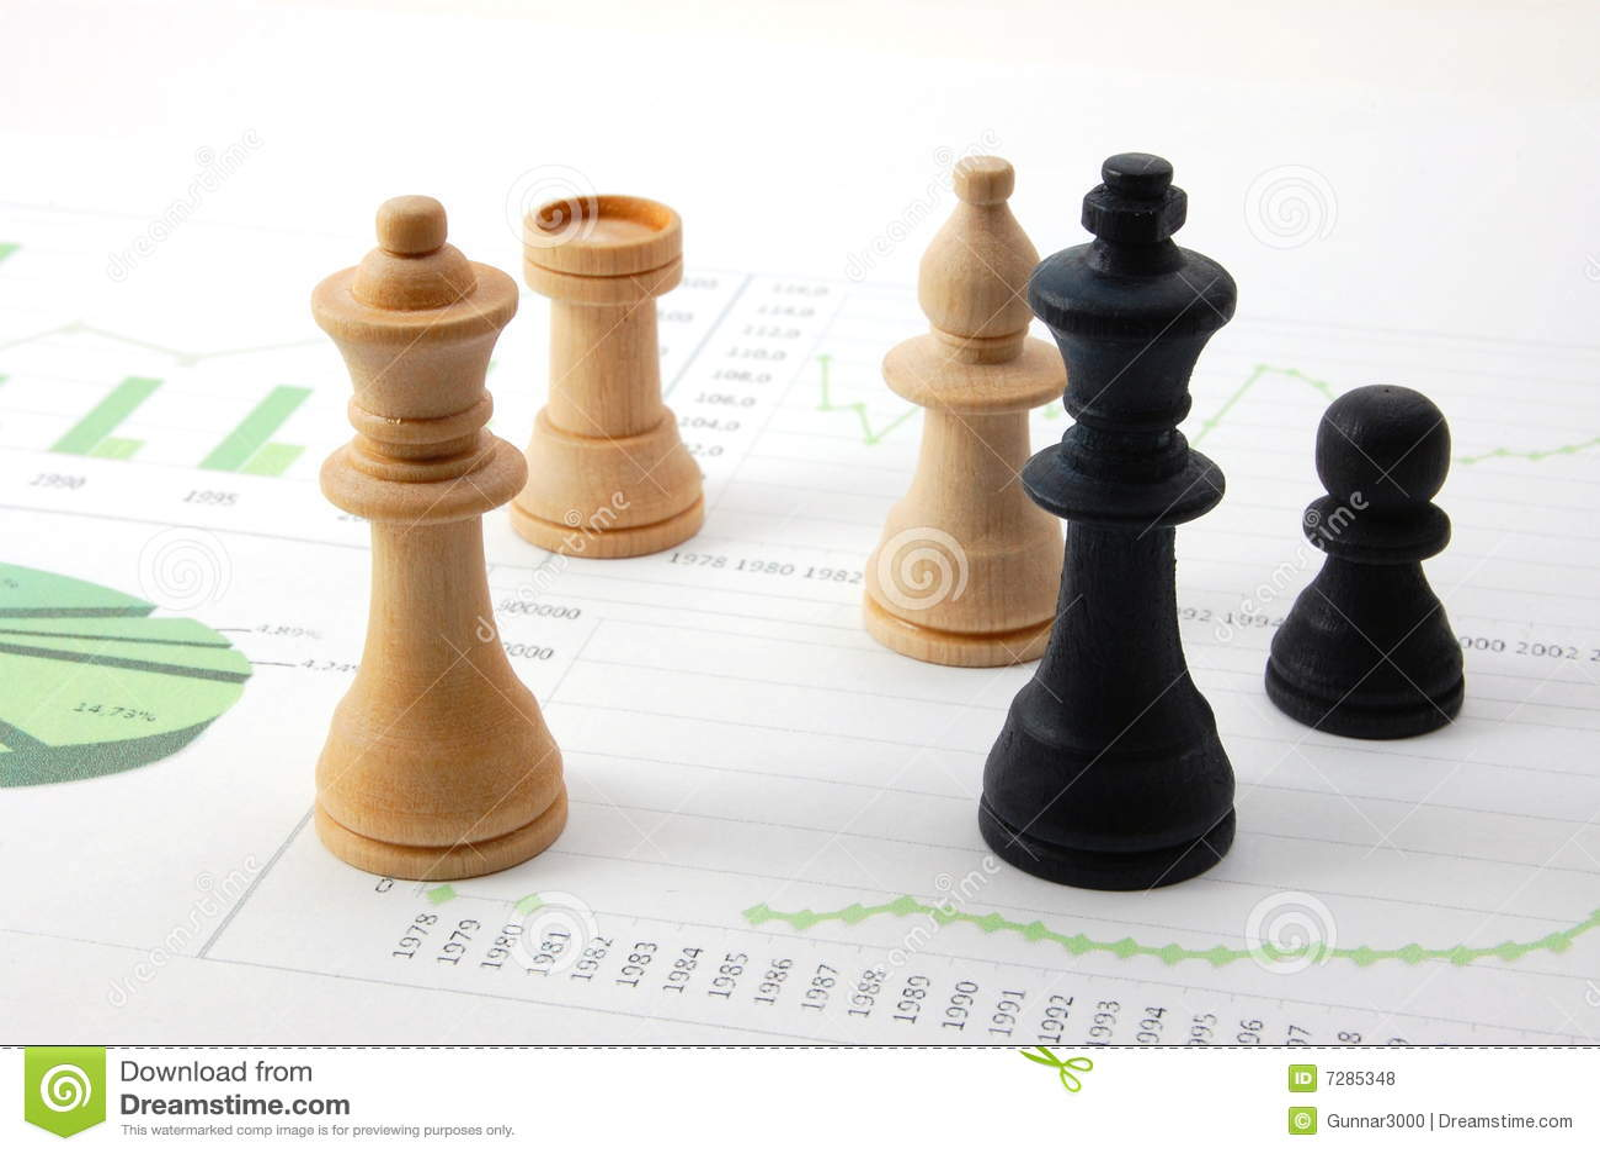 Hombre del ajedrez sobre carta de asunto